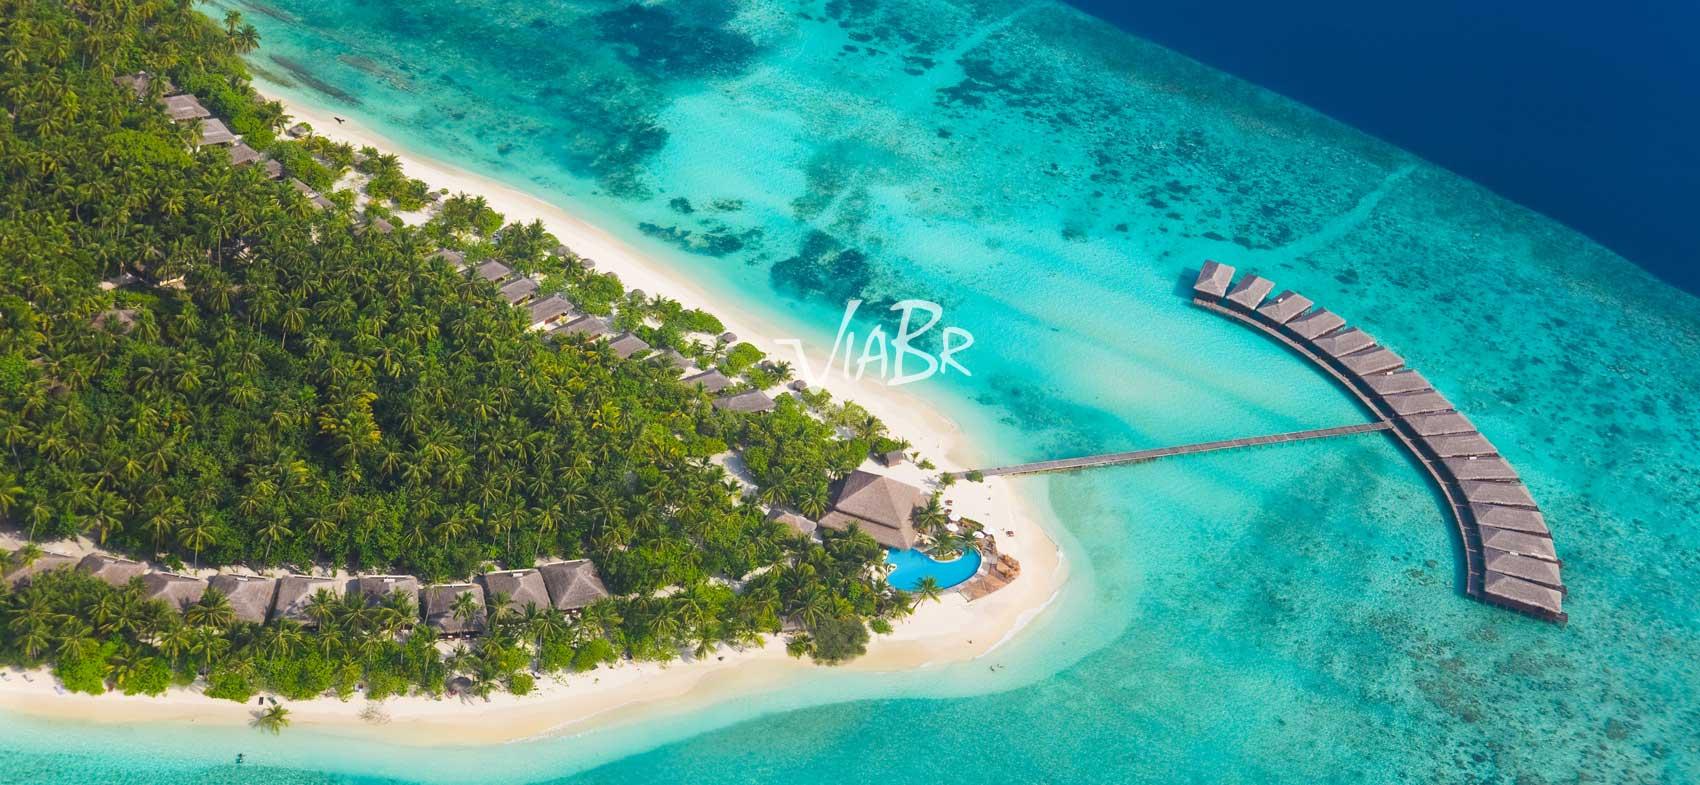 Pacote para Maldivas